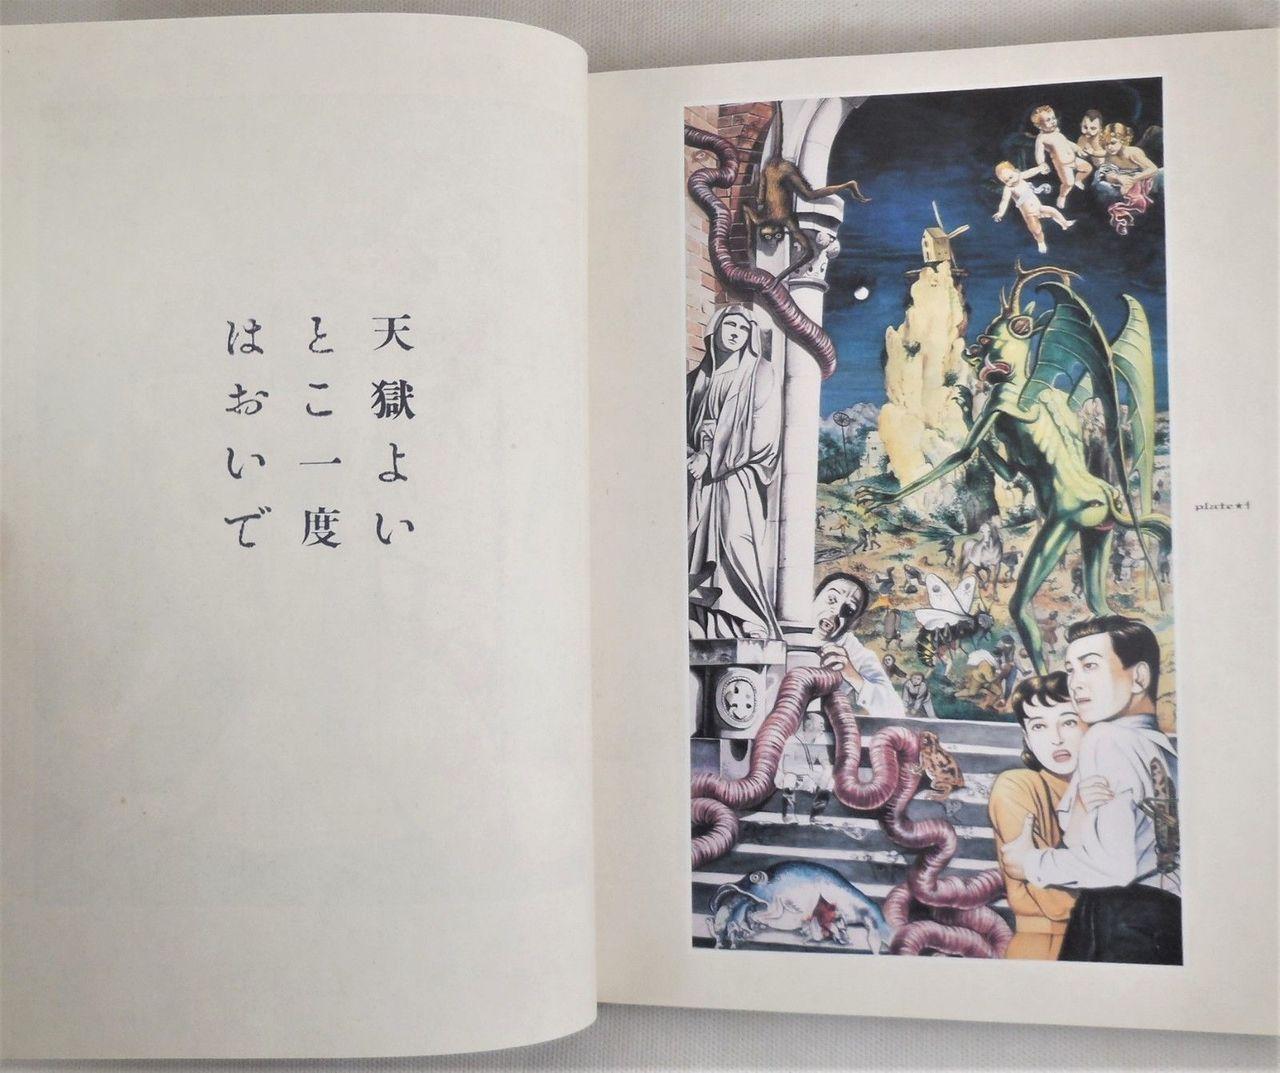 MARUOGRAPH 1, by Suehiro Maruo - 1996 [1st Ed]